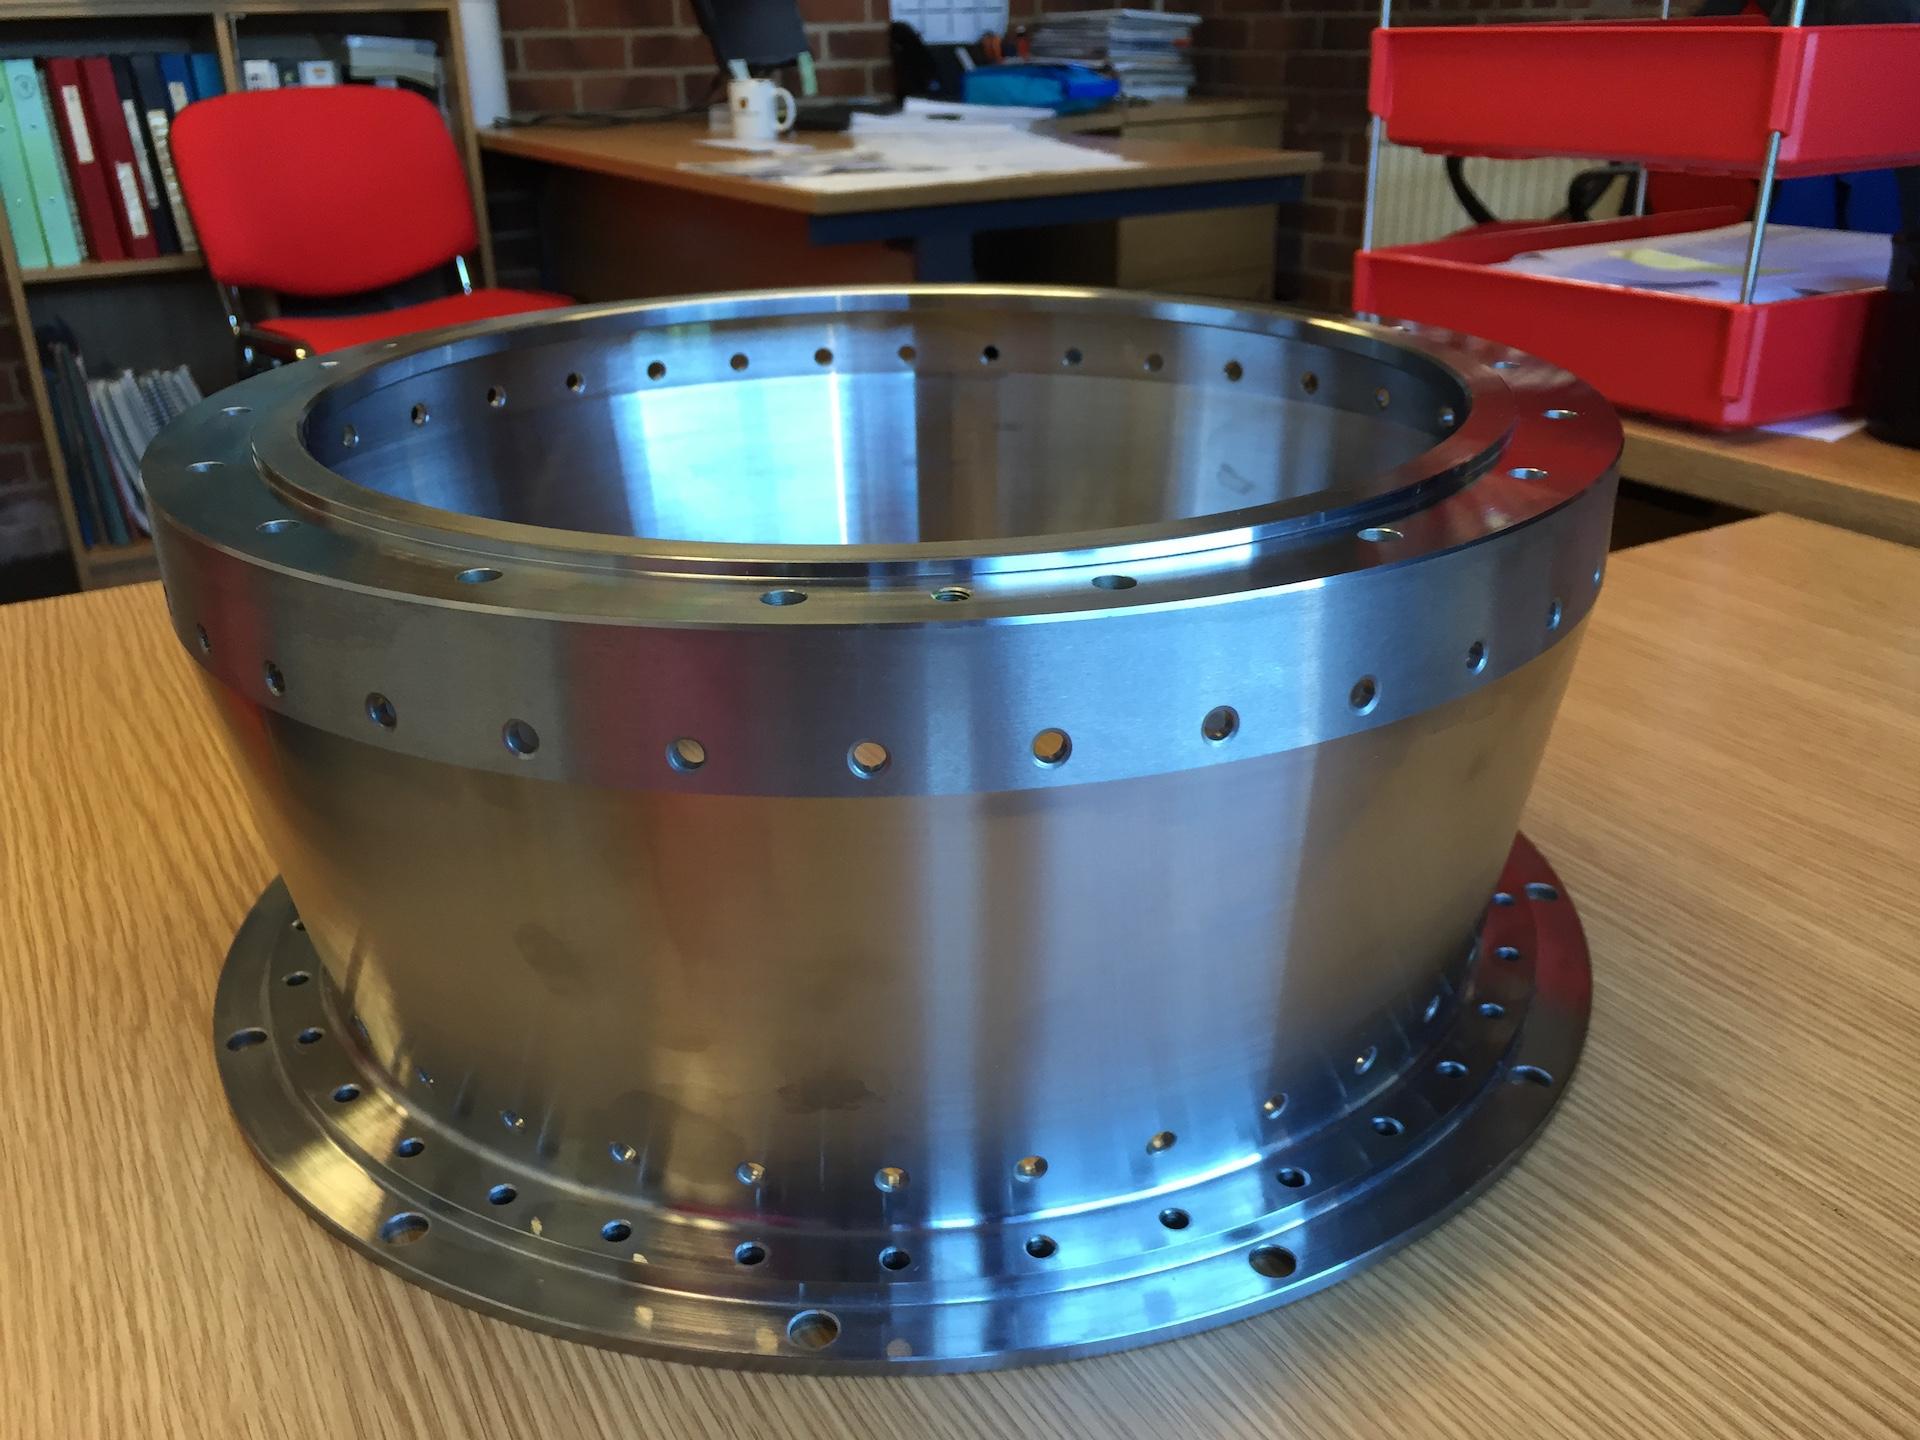 https://www.taylor-engineering.co.uk/wp-content/uploads/capabilities/turning/Doosan-400-parts-2.jpg